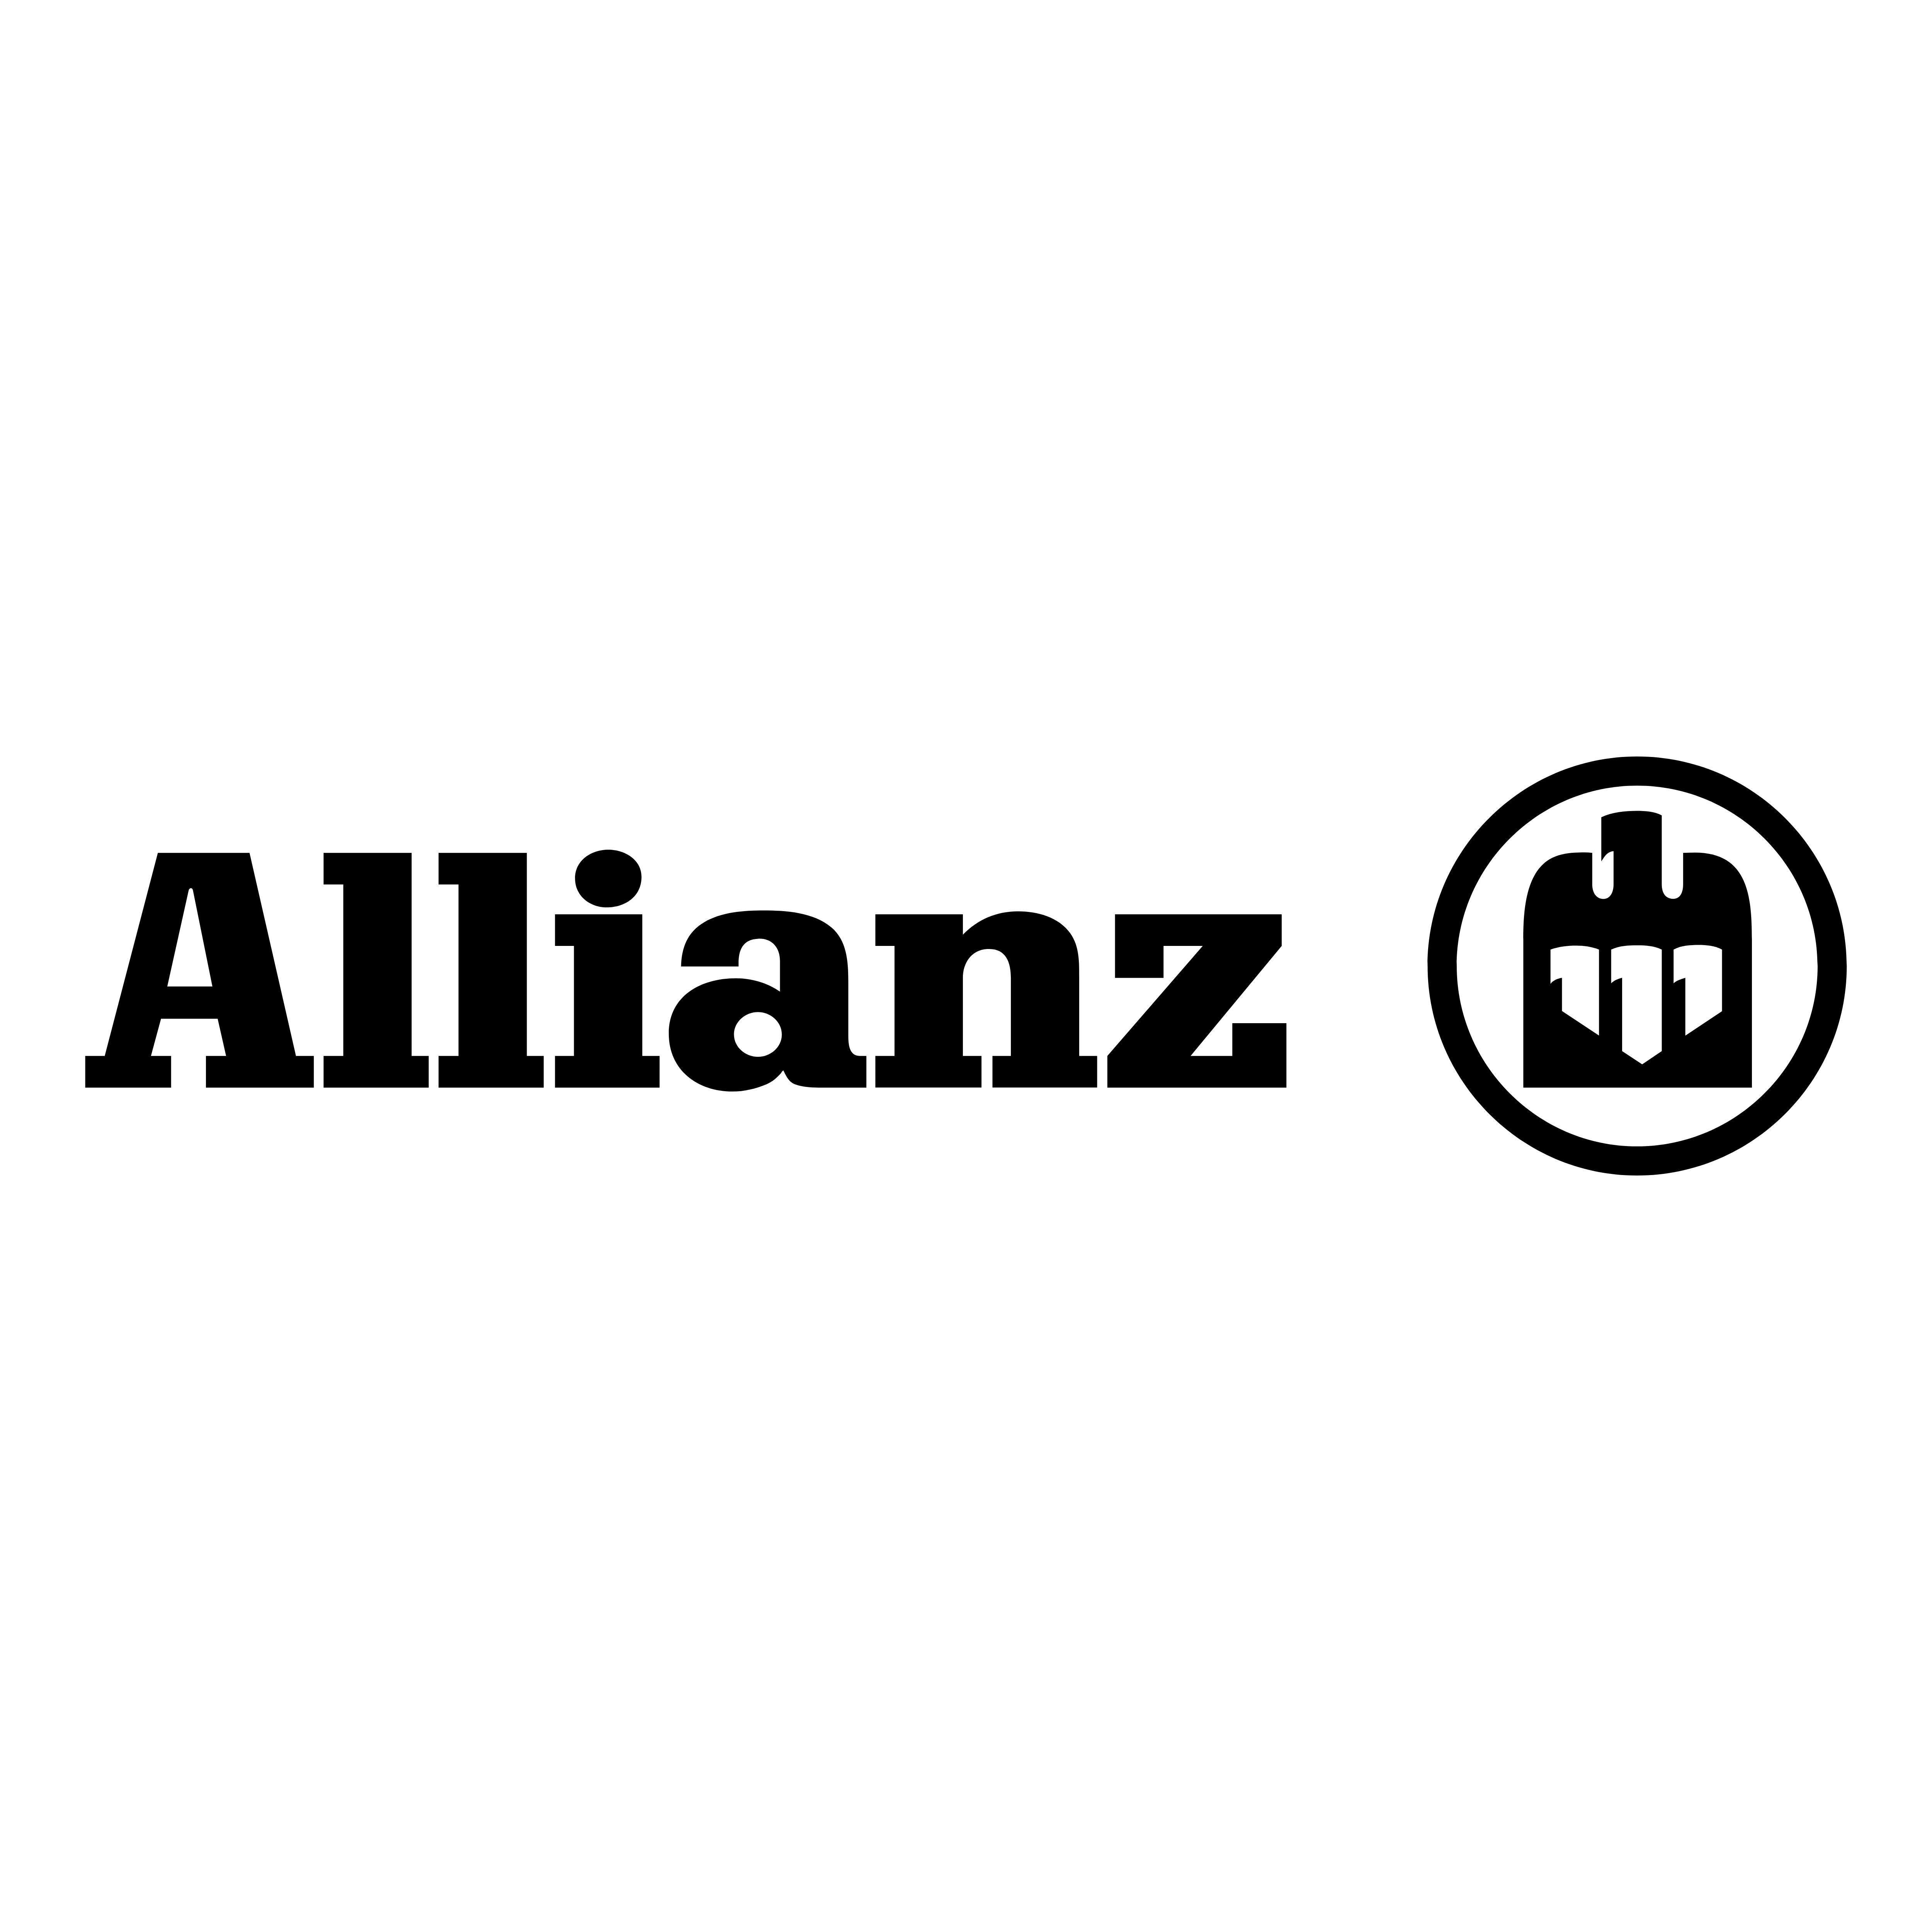 Allianz Logos Download